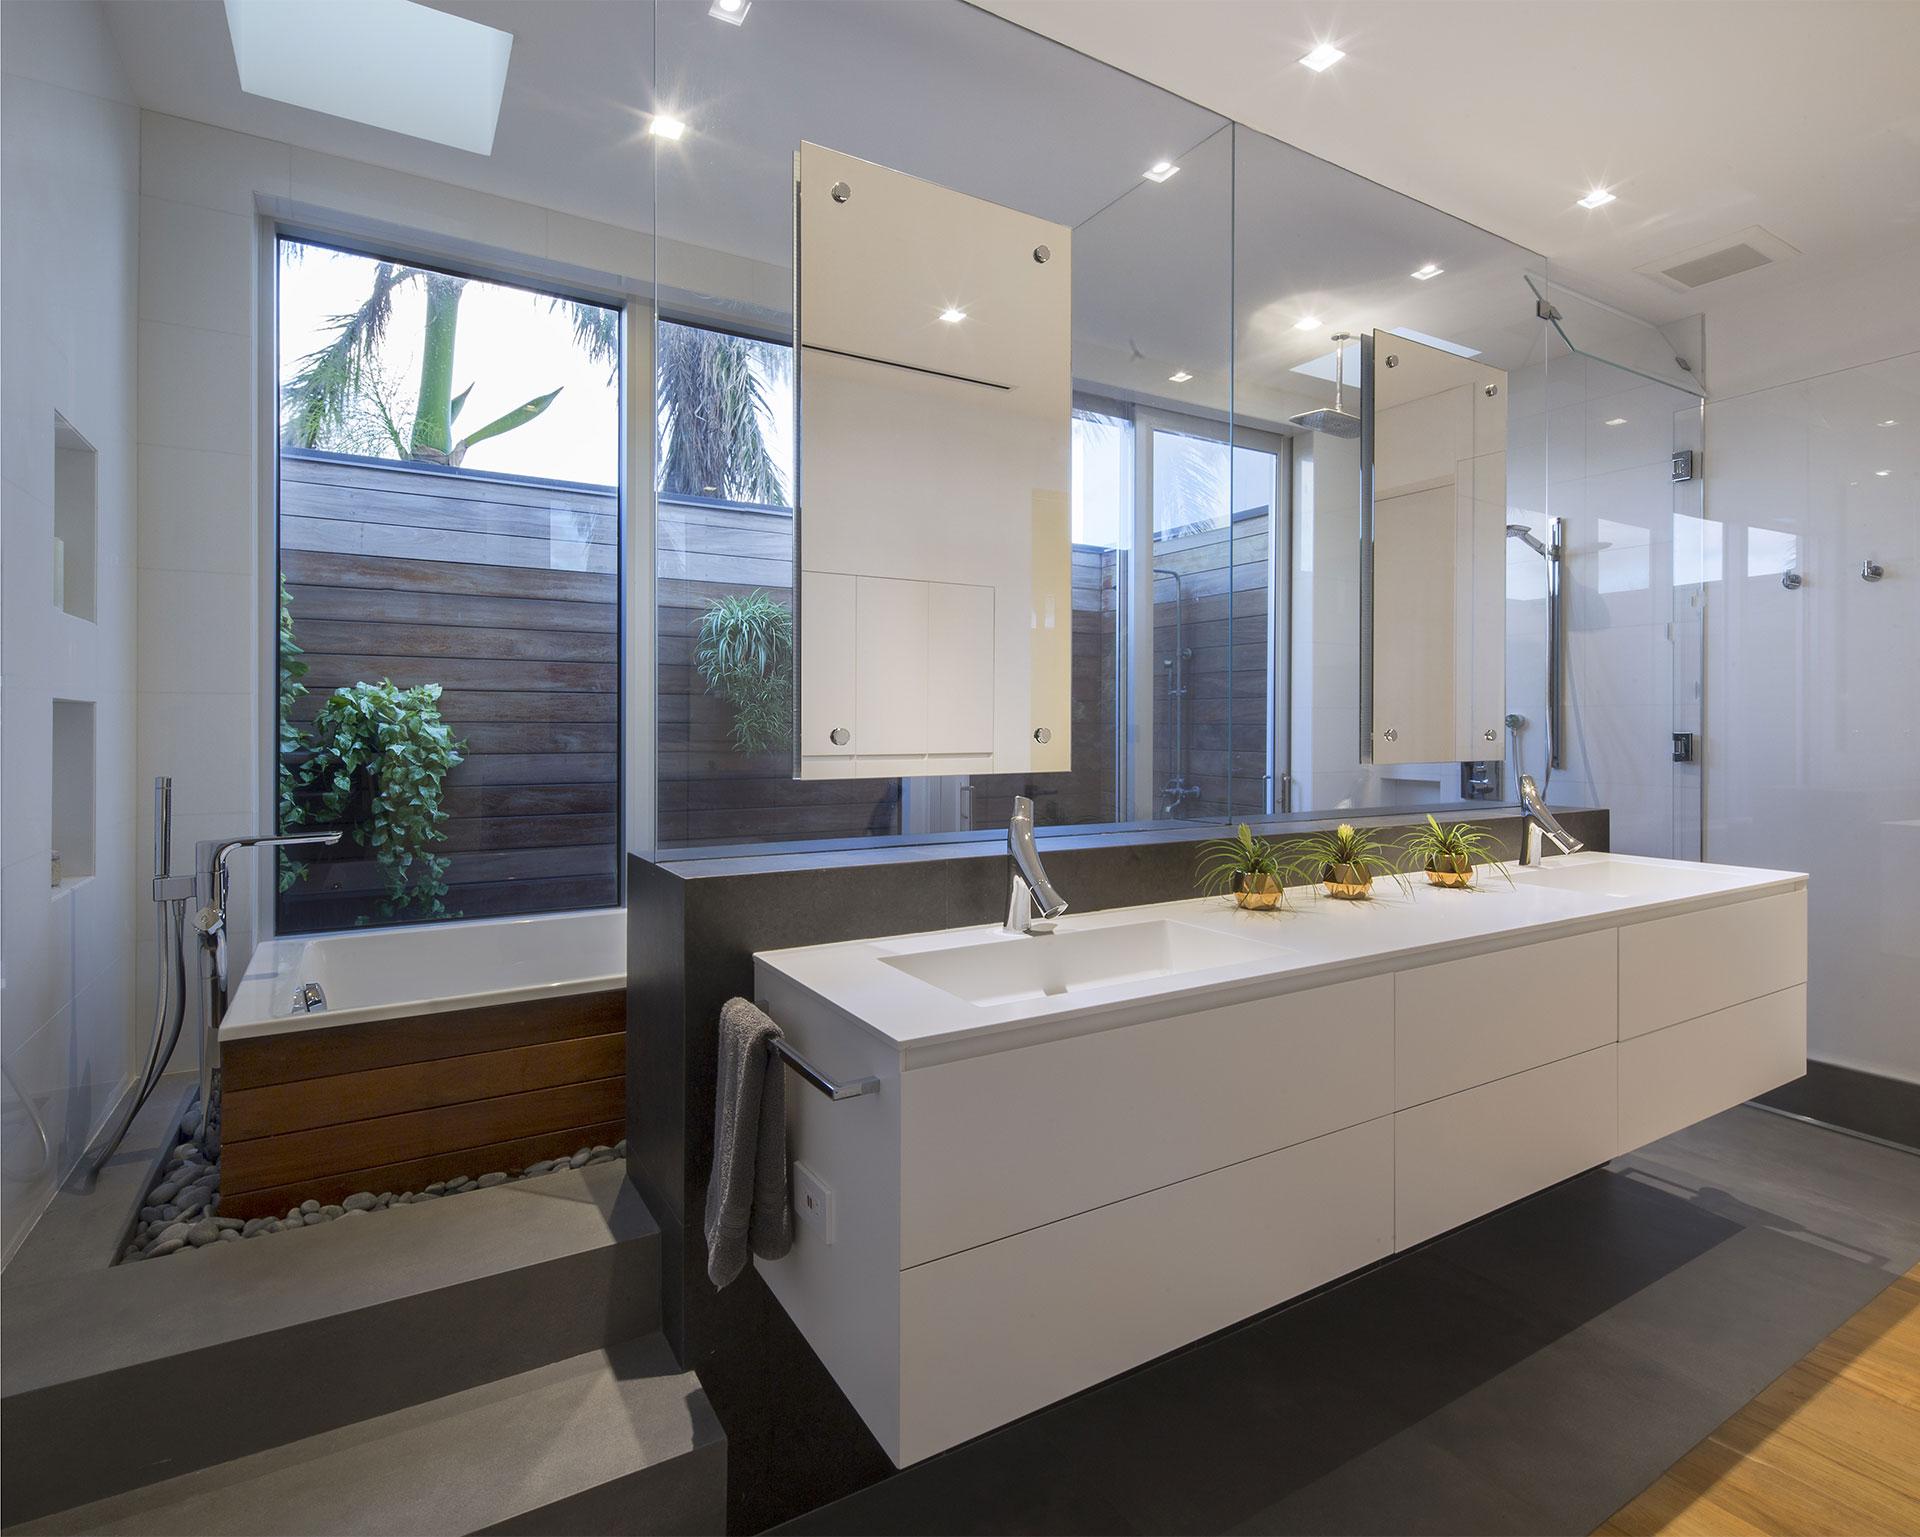 Bathroom Side View Interior Design project in 484 North Parkway, Florida